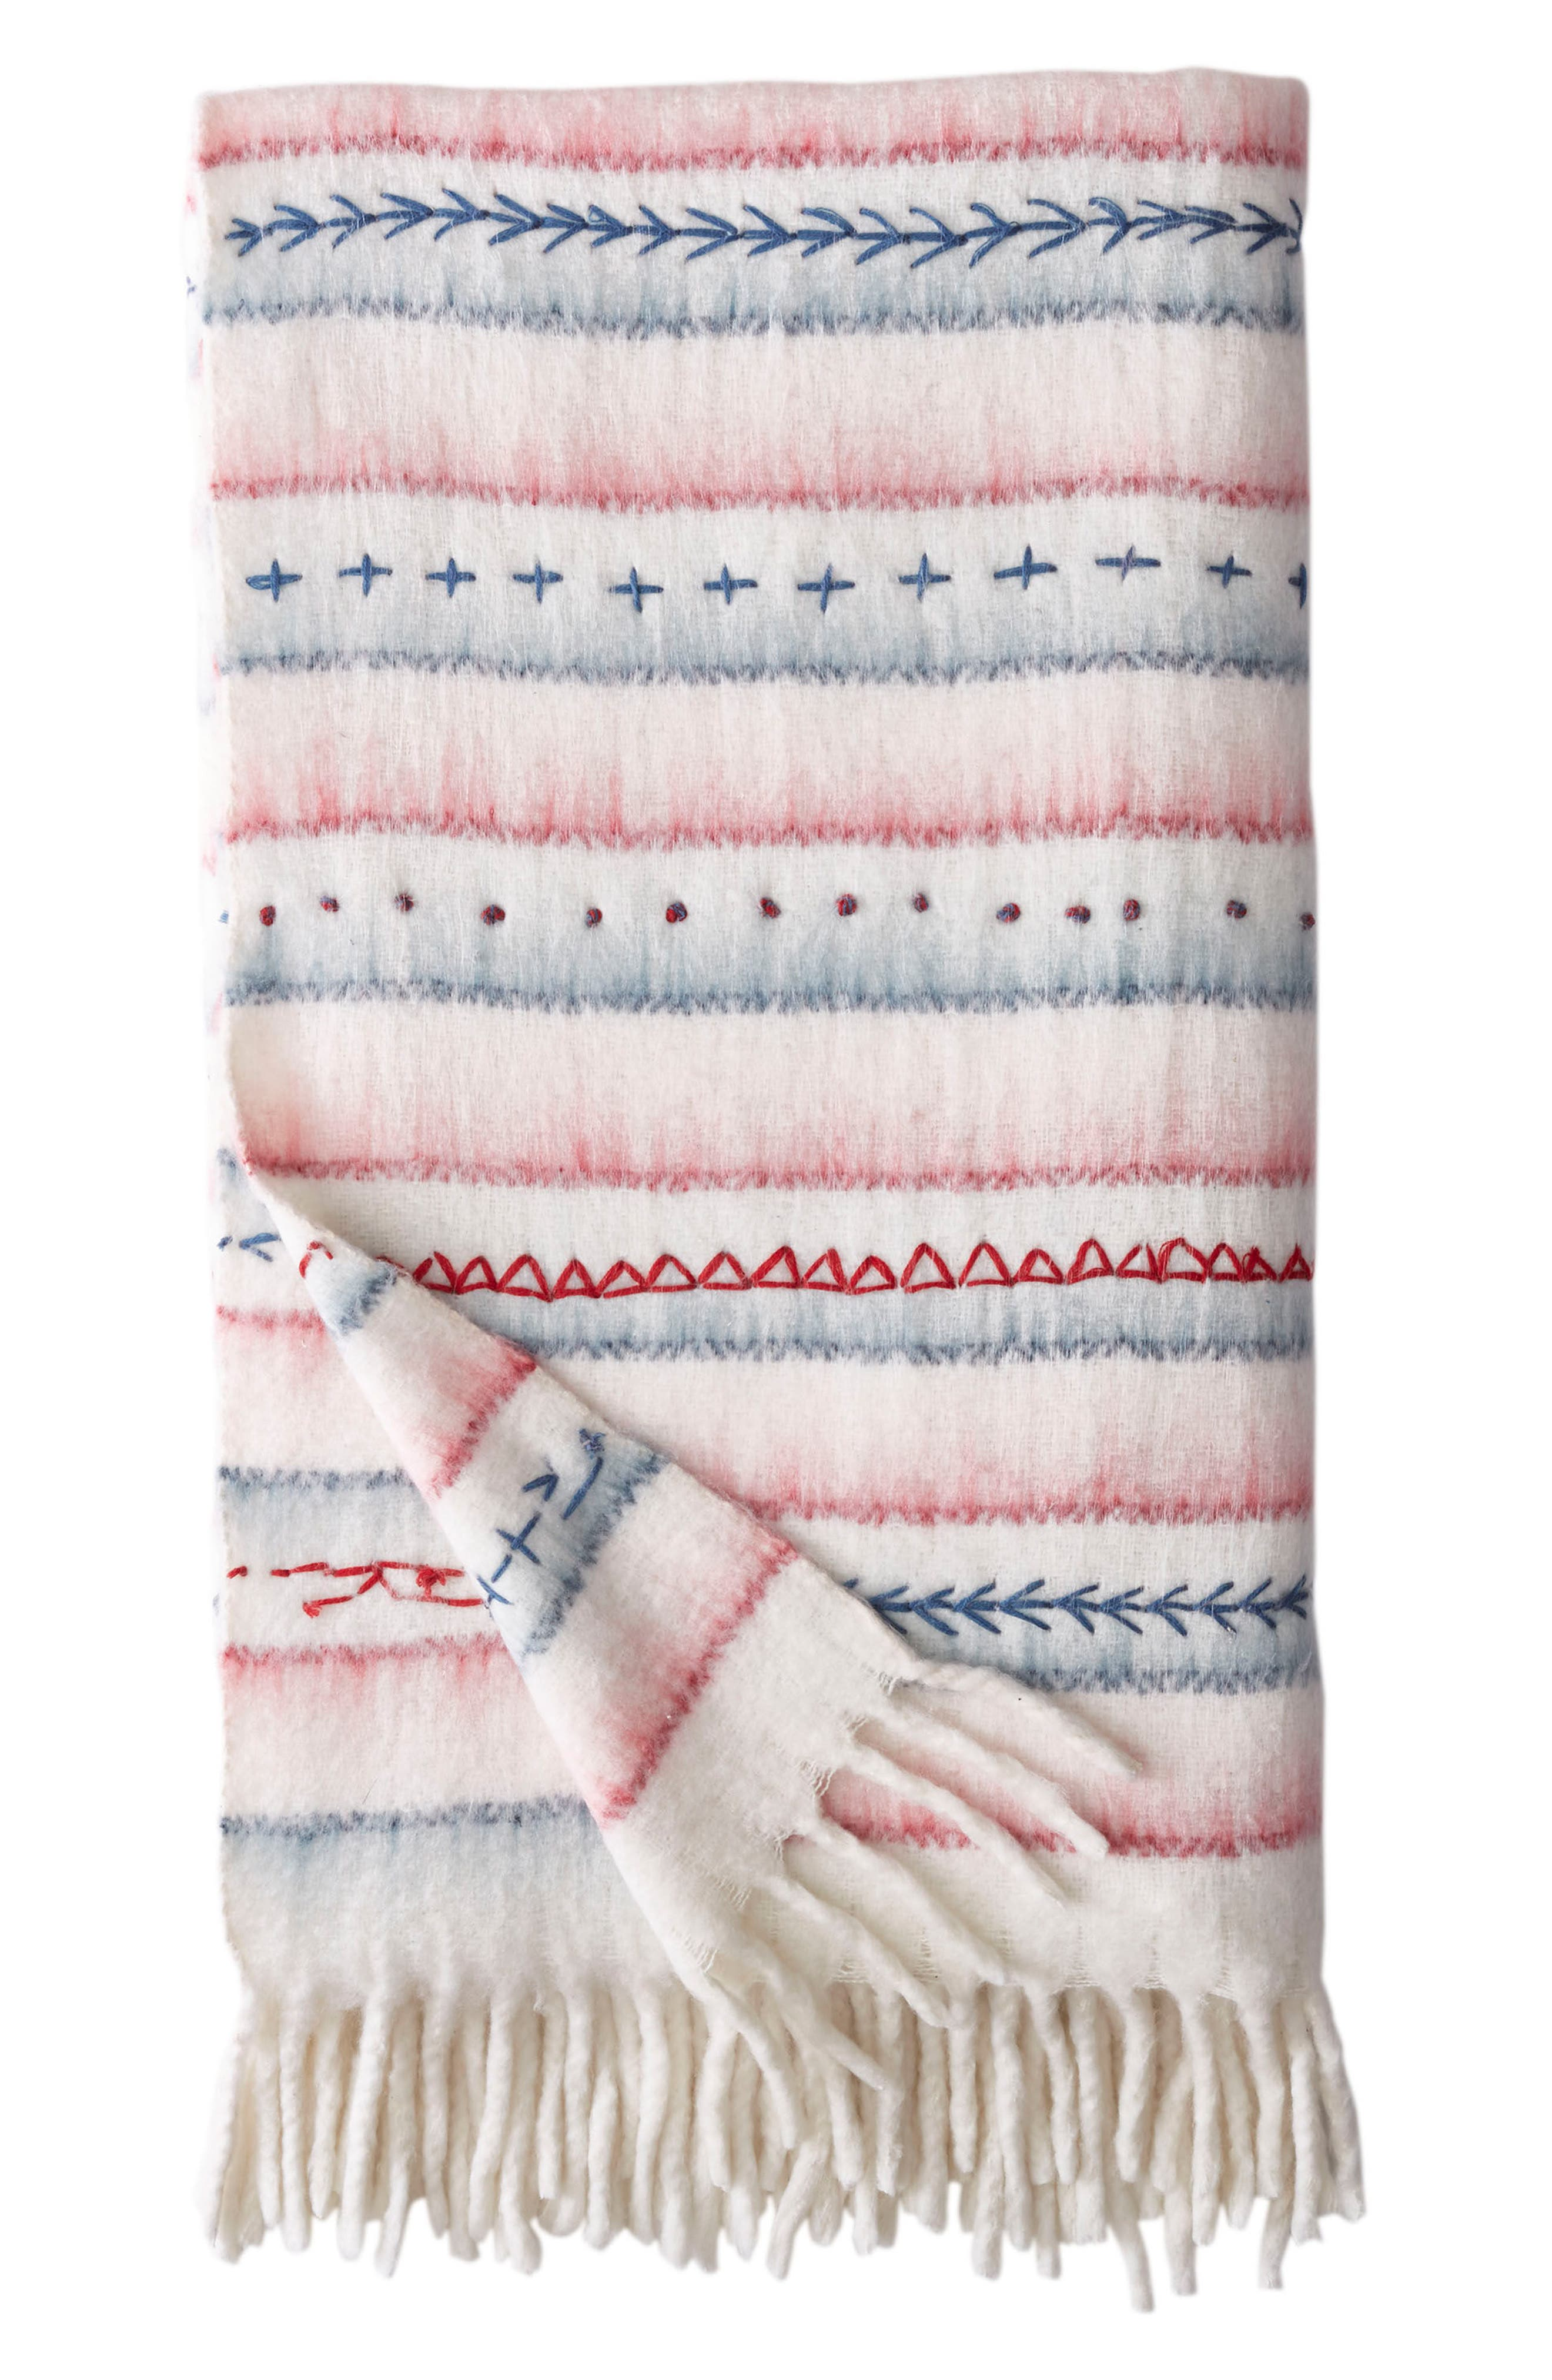 Alternate Image 1 Selected - Tommy Hilfiger American Dream Throw Blanket